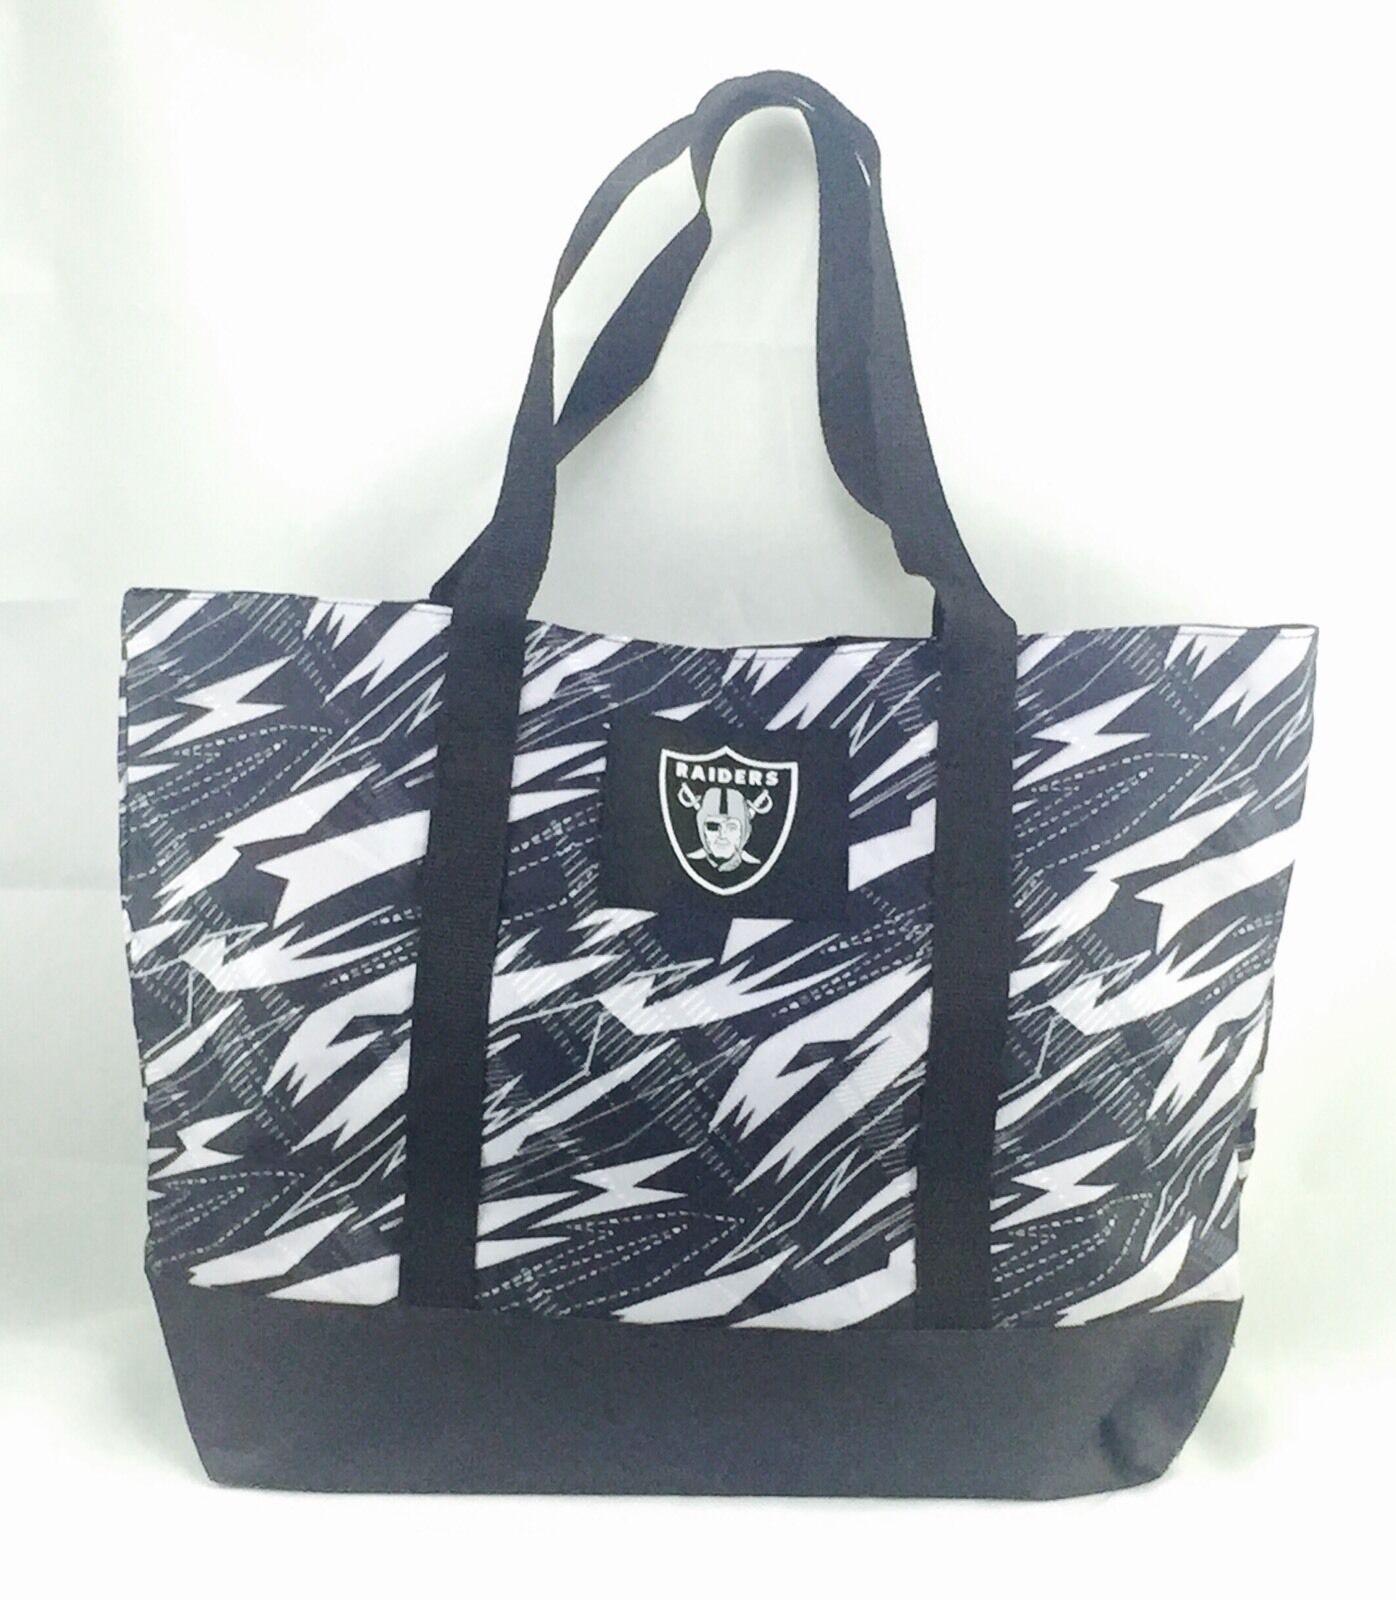 d311a5bfe9e NFL San Francisco 49ers Women s Shatter Tote Bag